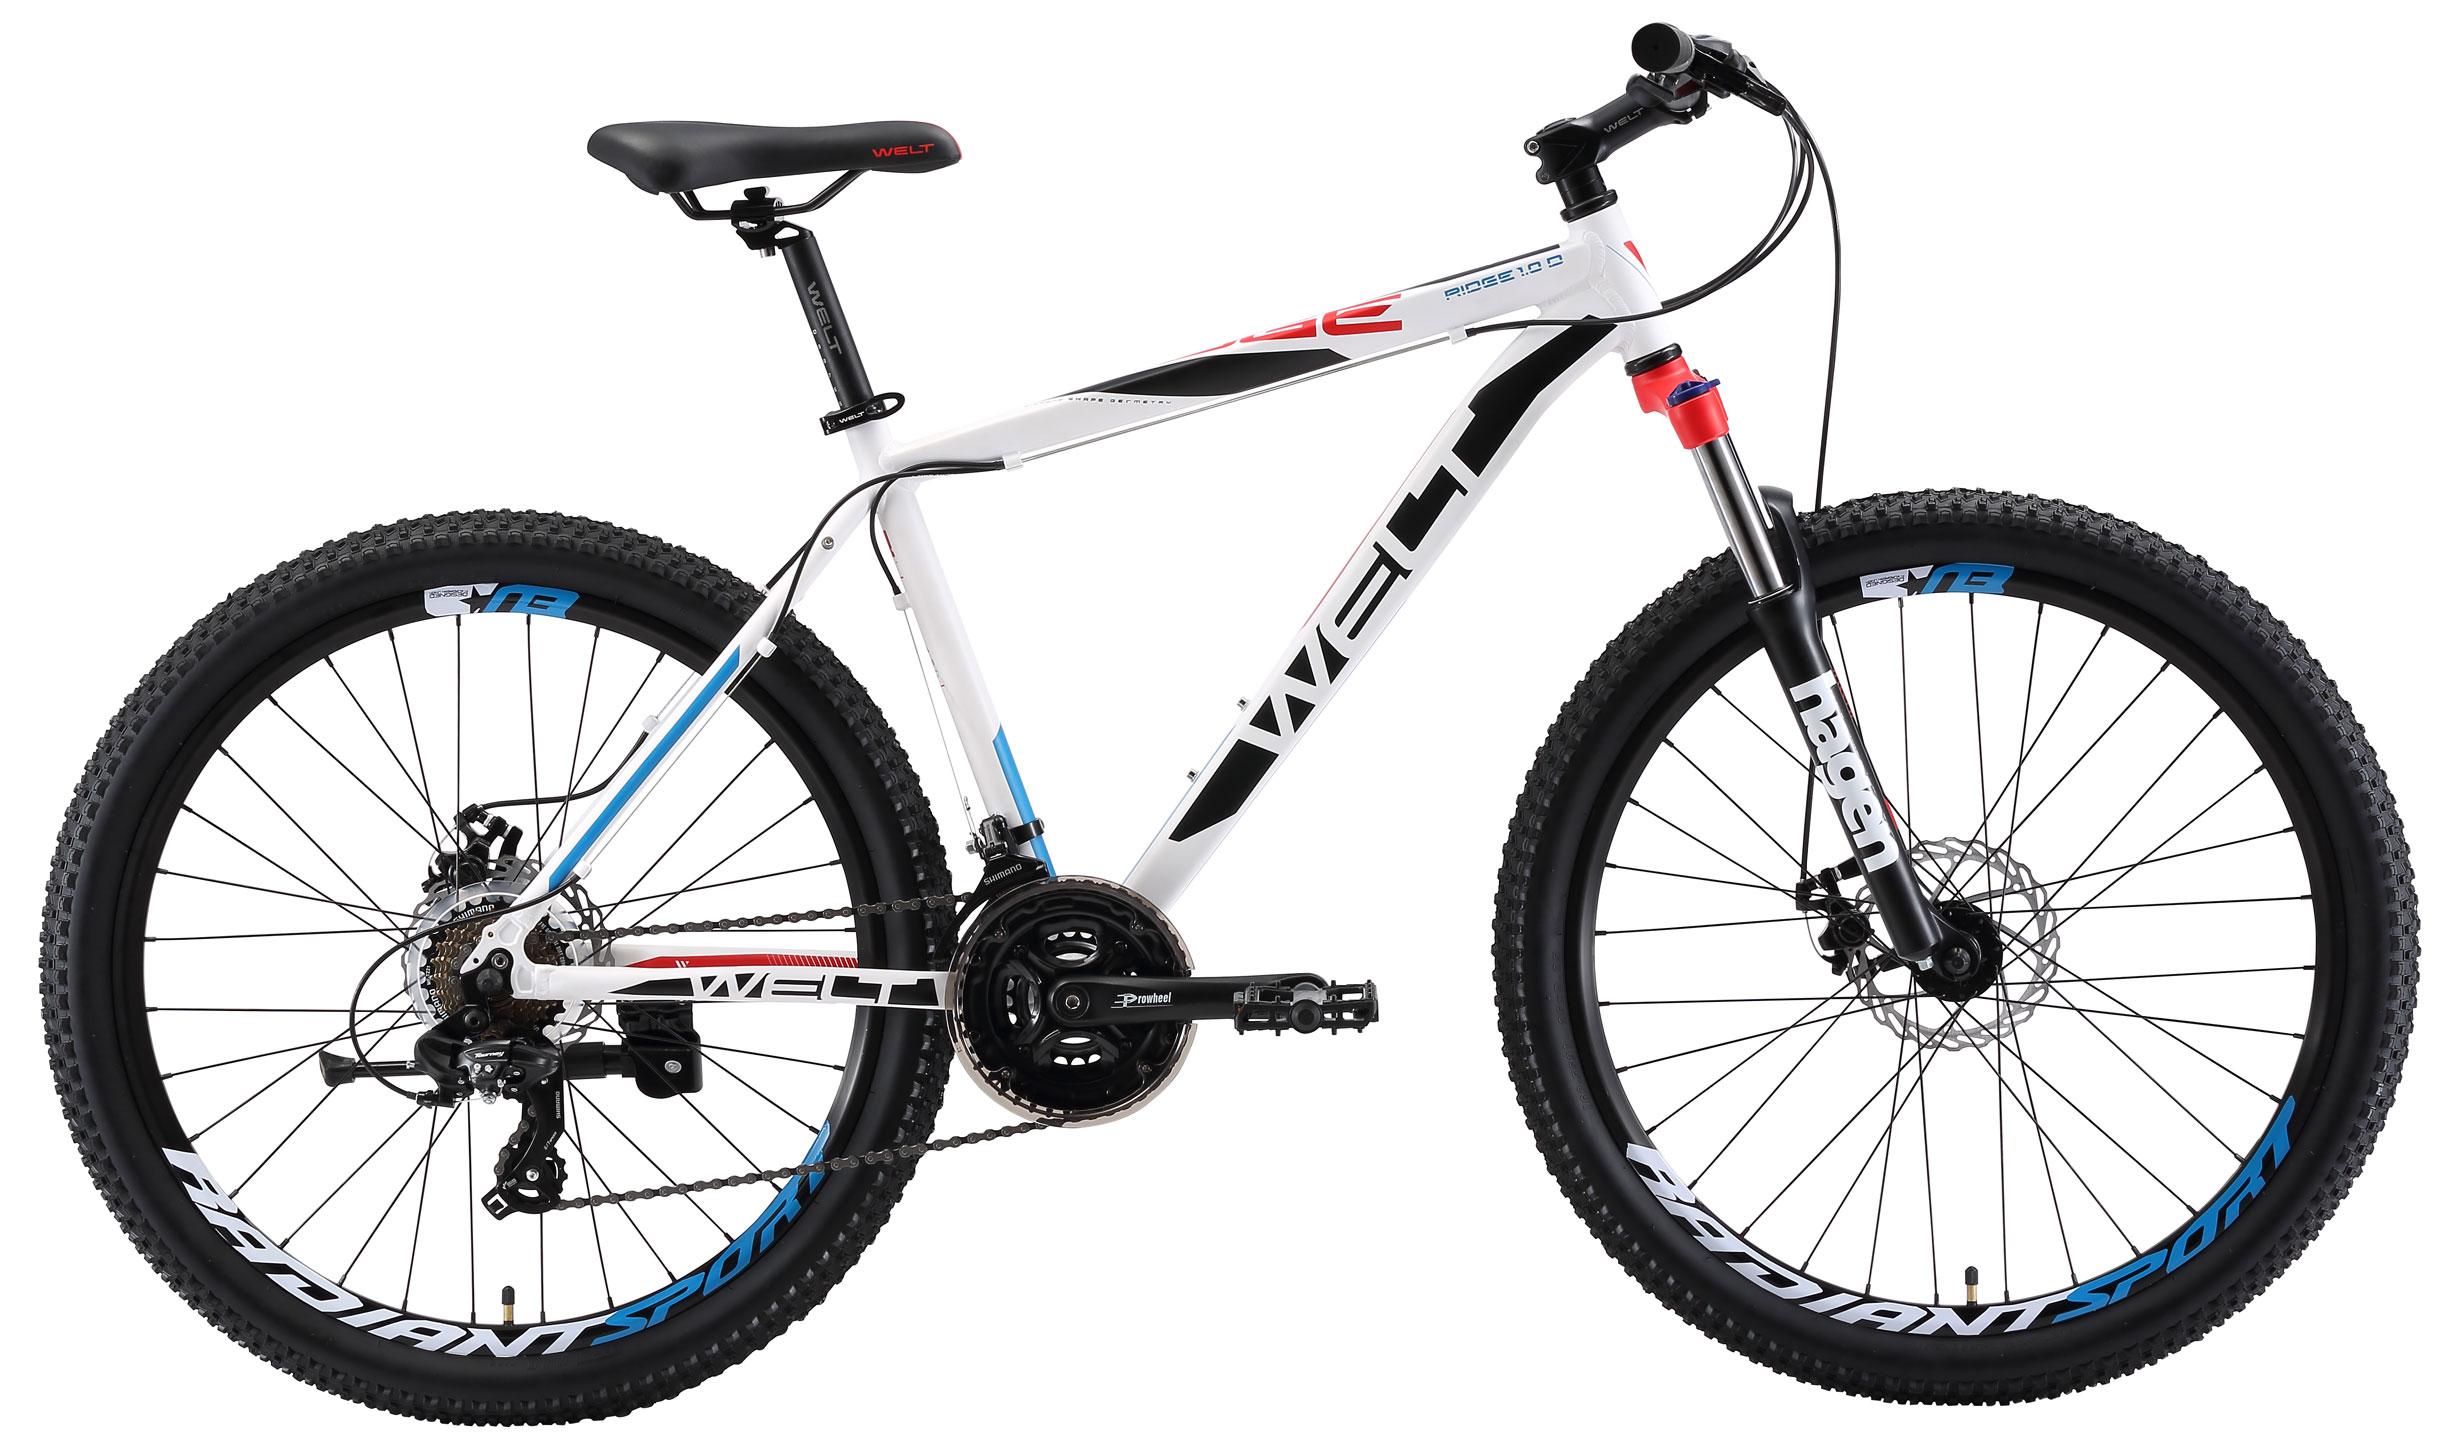 Велосипед Welt 2018 Ridge 1.0 D matt white/black/red (US:S), Велосипеды - арт. 997480390